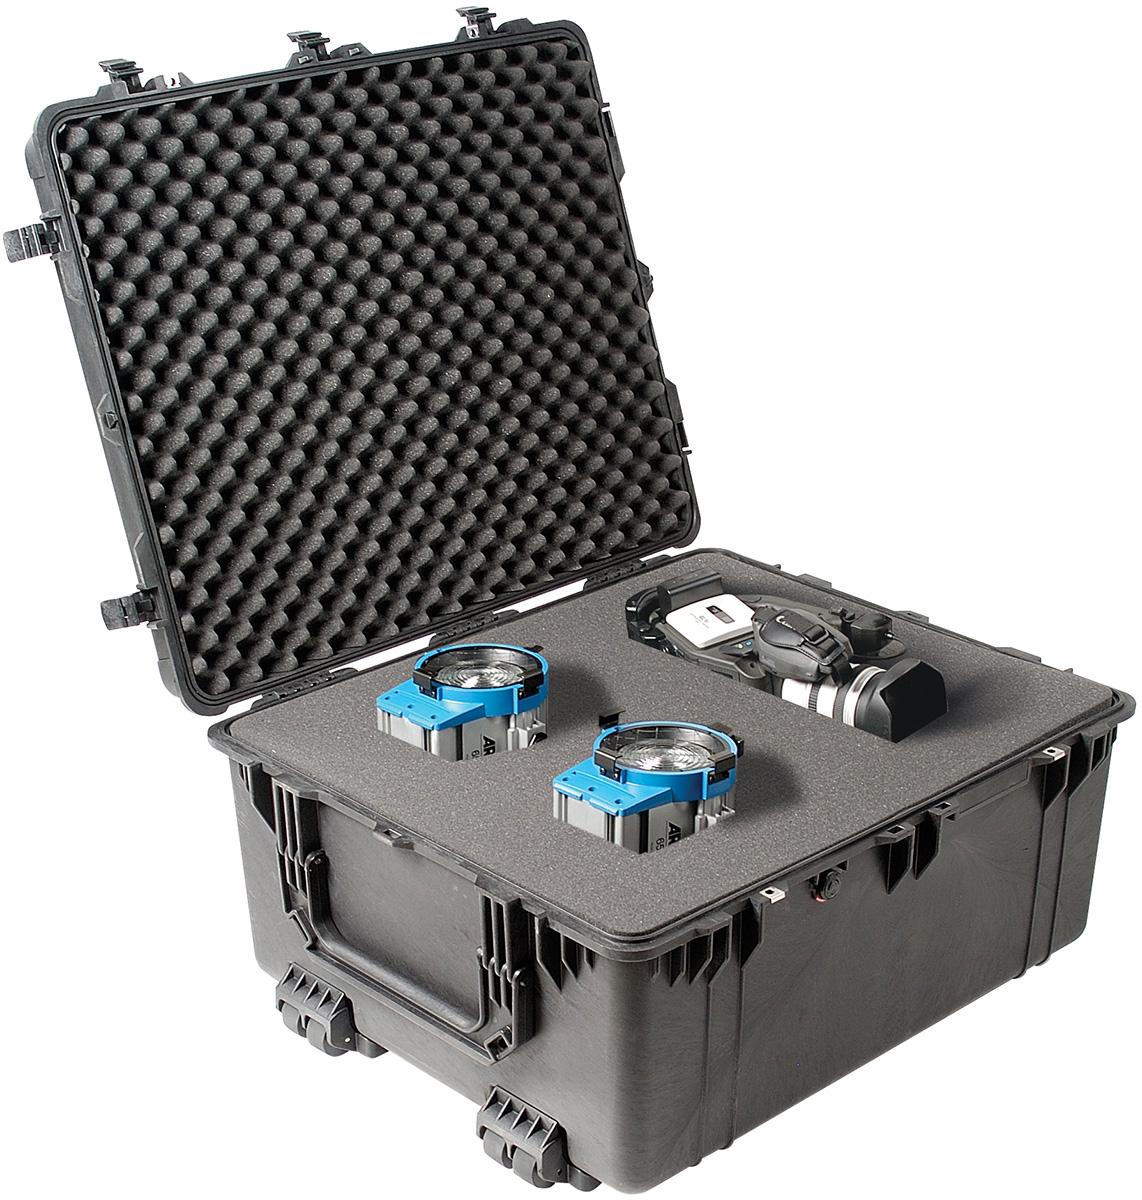 pelican rolling video film camera gear case